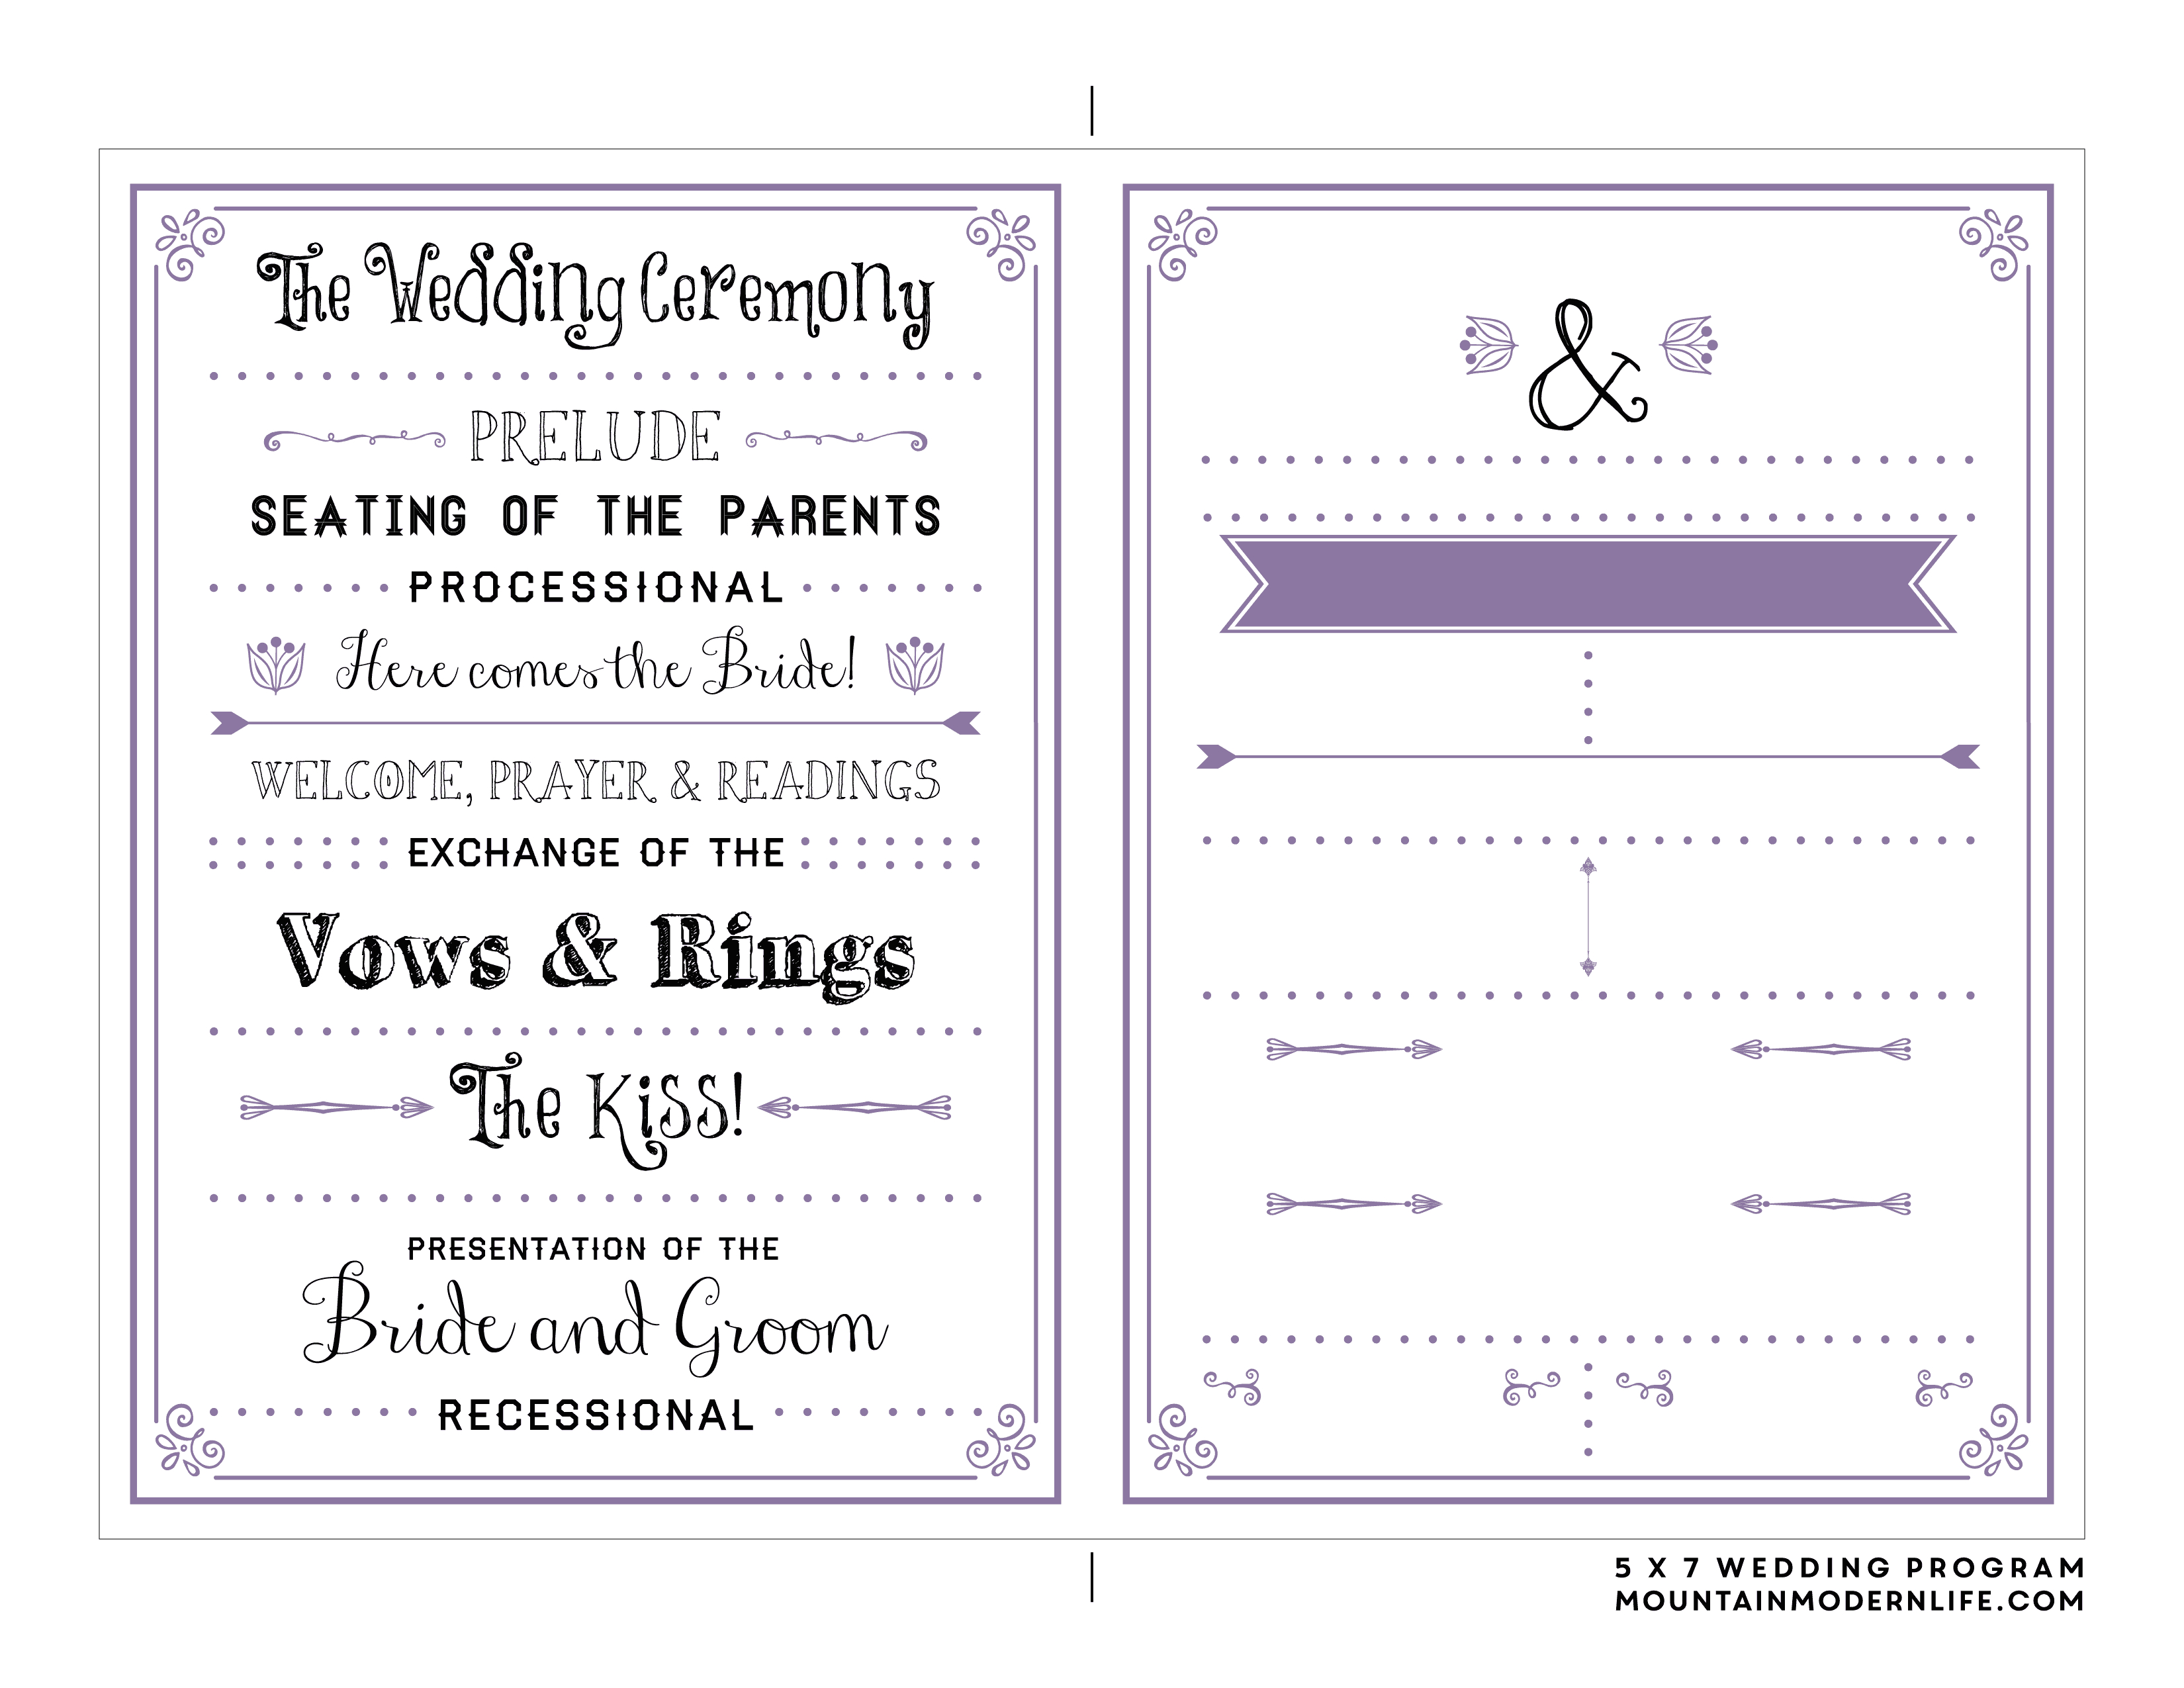 Free Printable Wedding Program | Mountainmodernlife - Free Printable Wedding Programs